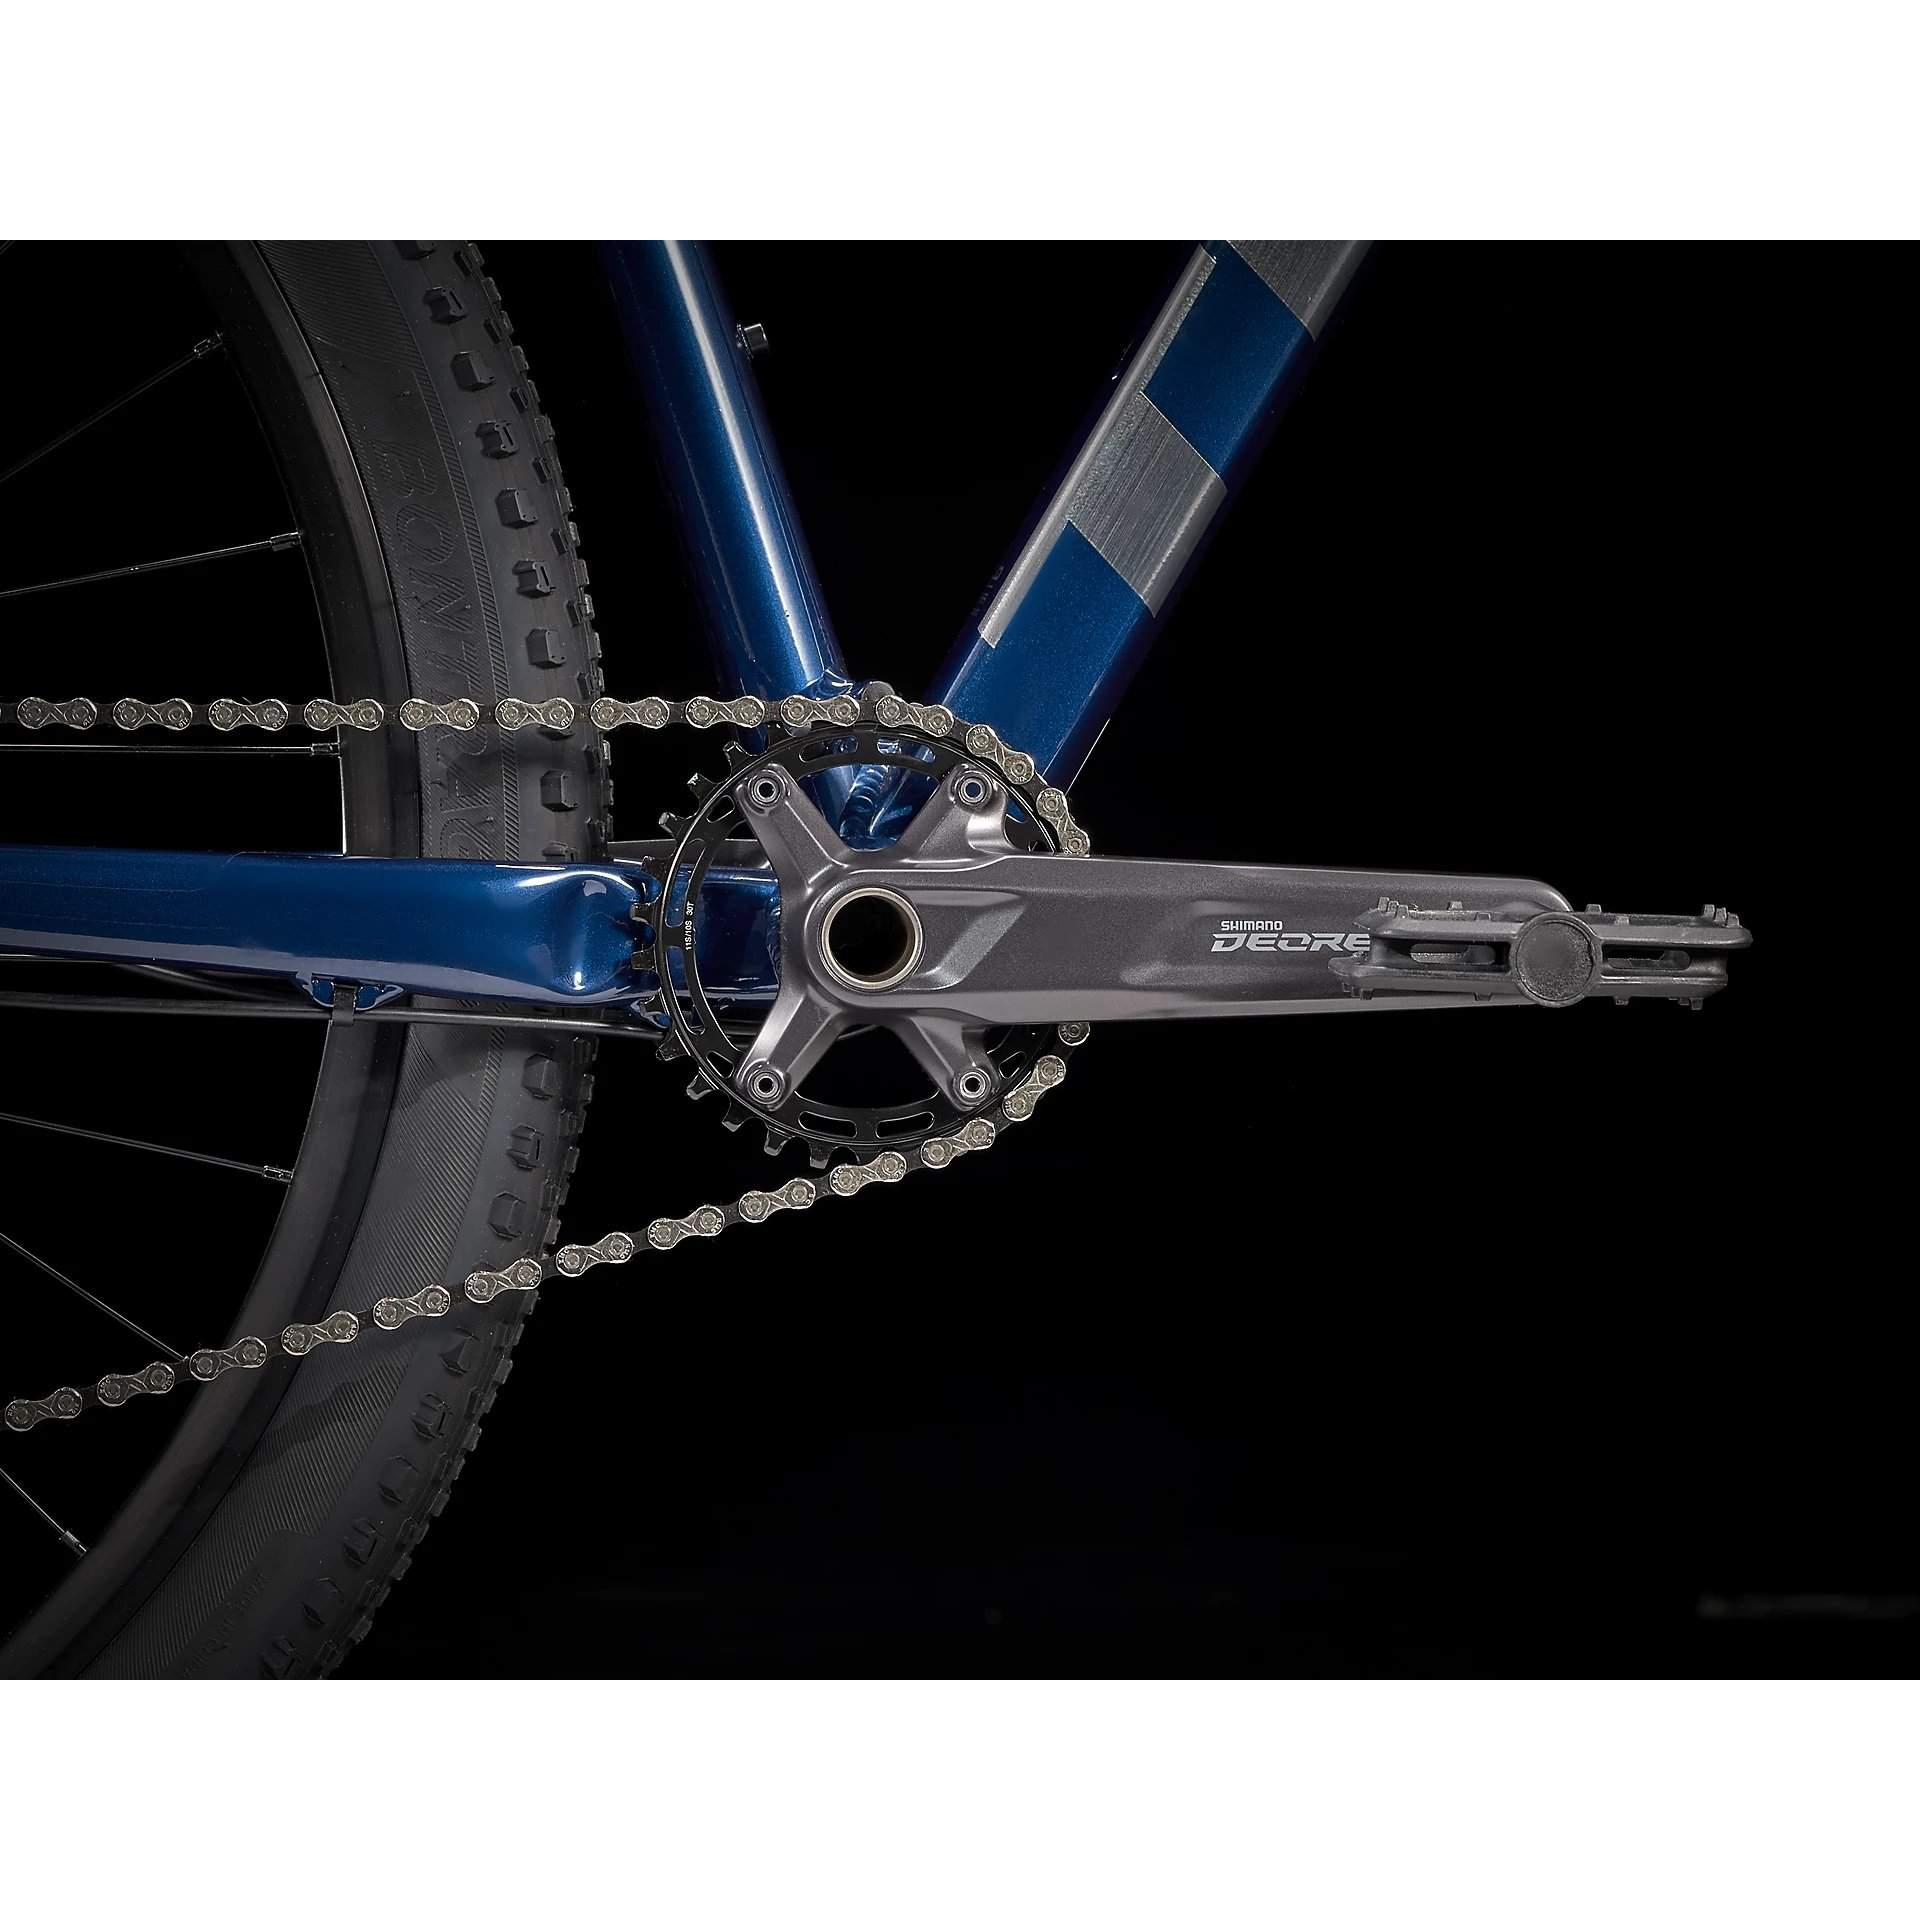 ROWER TREK X-CALIBER 7 MULSANNE BLUE|ANTHRACITE 4